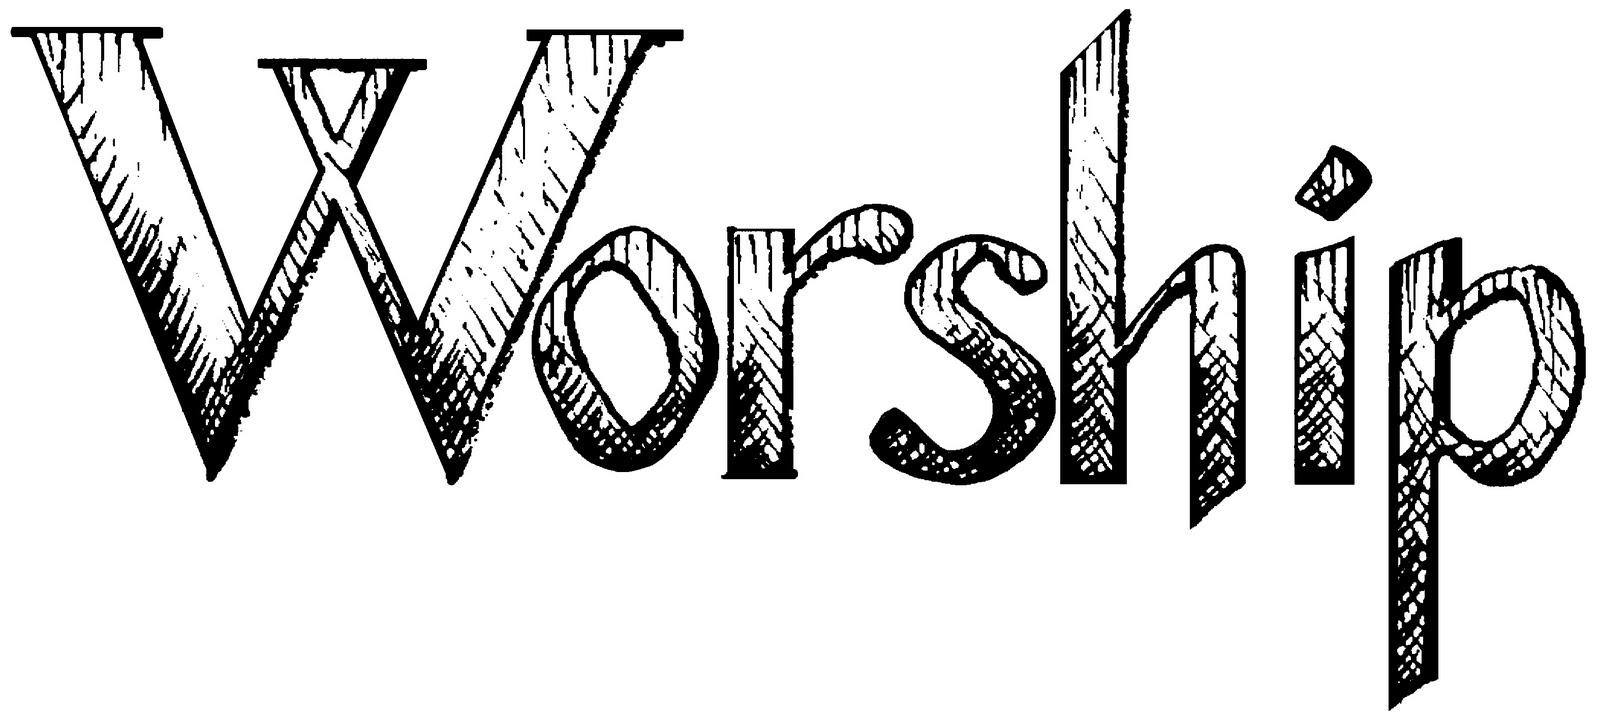 Free Sunday Worship Cliparts, Download Free Sunday Worship